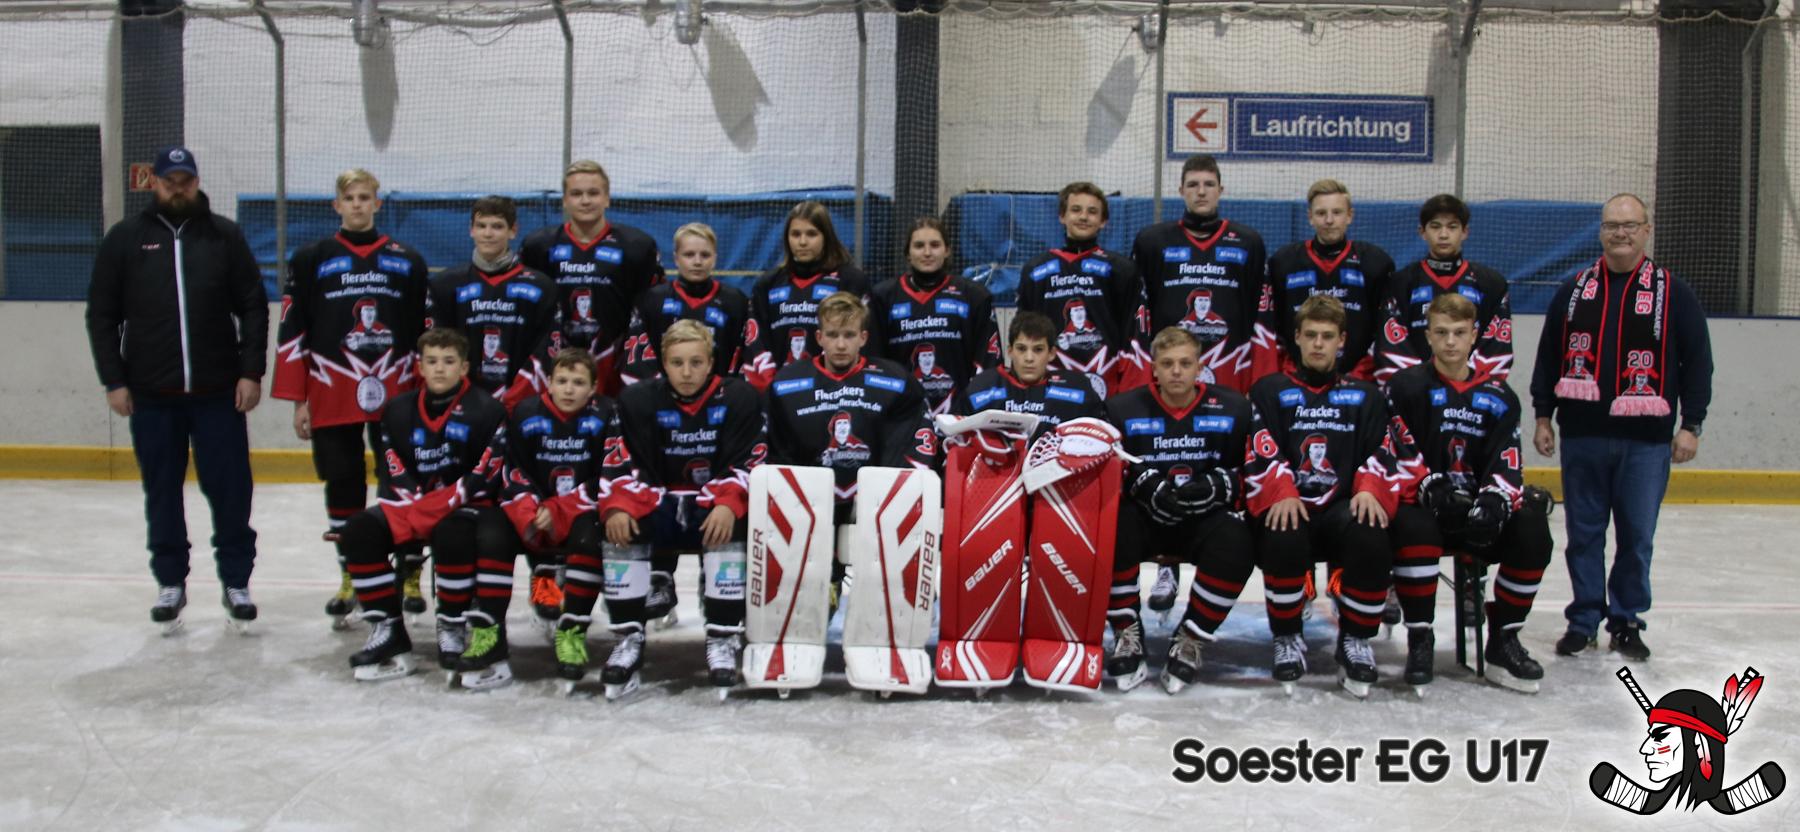 seg_u17_teamfoto_1800_marked.jpg